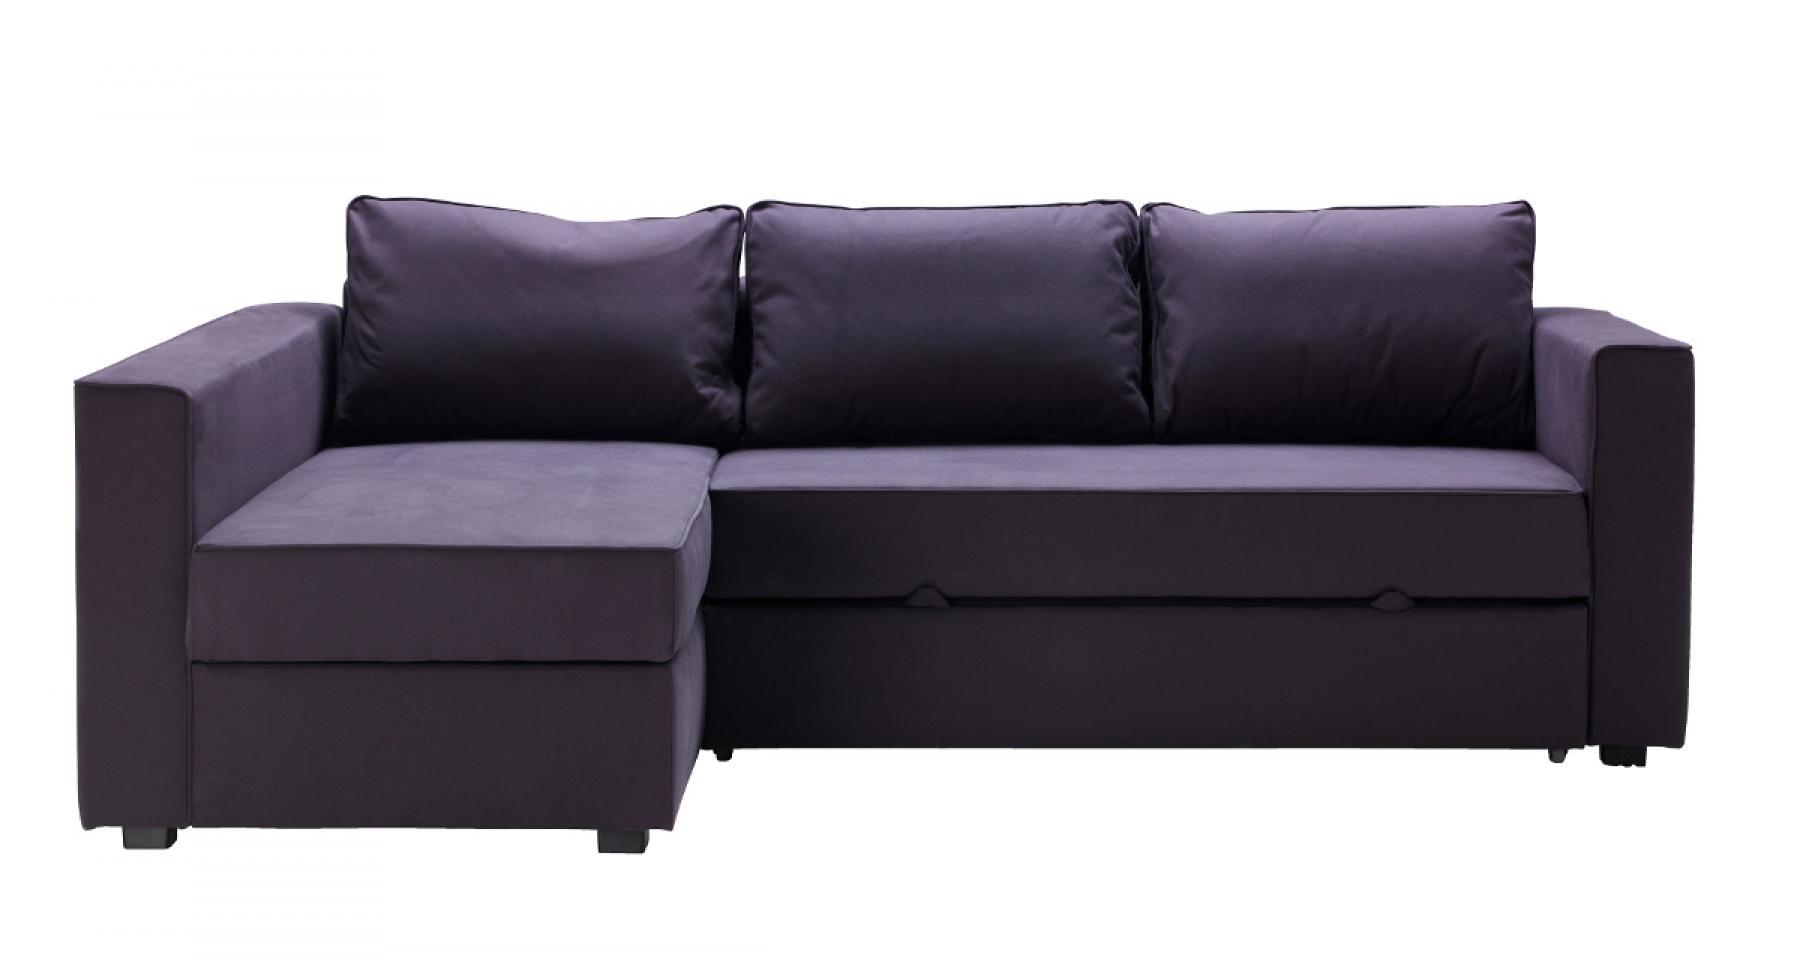 canap lit ikea mode d emploi. Black Bedroom Furniture Sets. Home Design Ideas